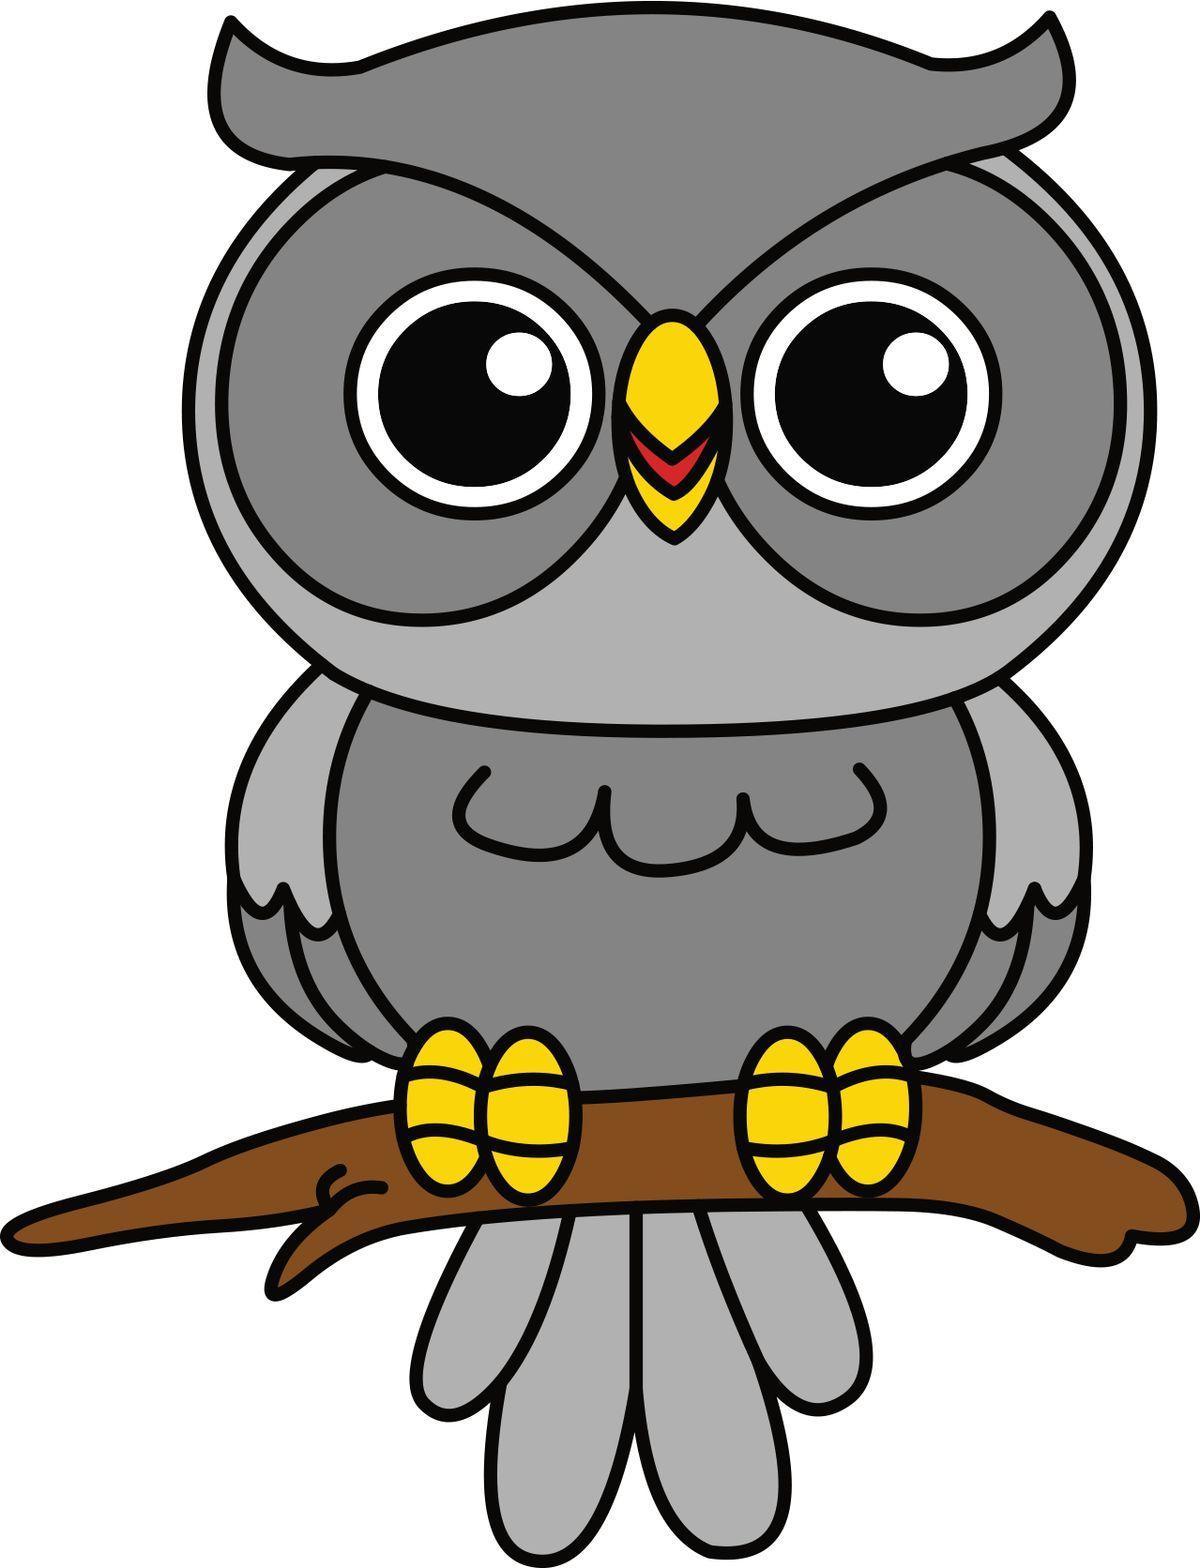 ಌ‿ ⁀ᎧᏇℓs‿ ⁀ಌ | Cute easy animal drawings, Animal clipart ... (1200 x 1568 Pixel)